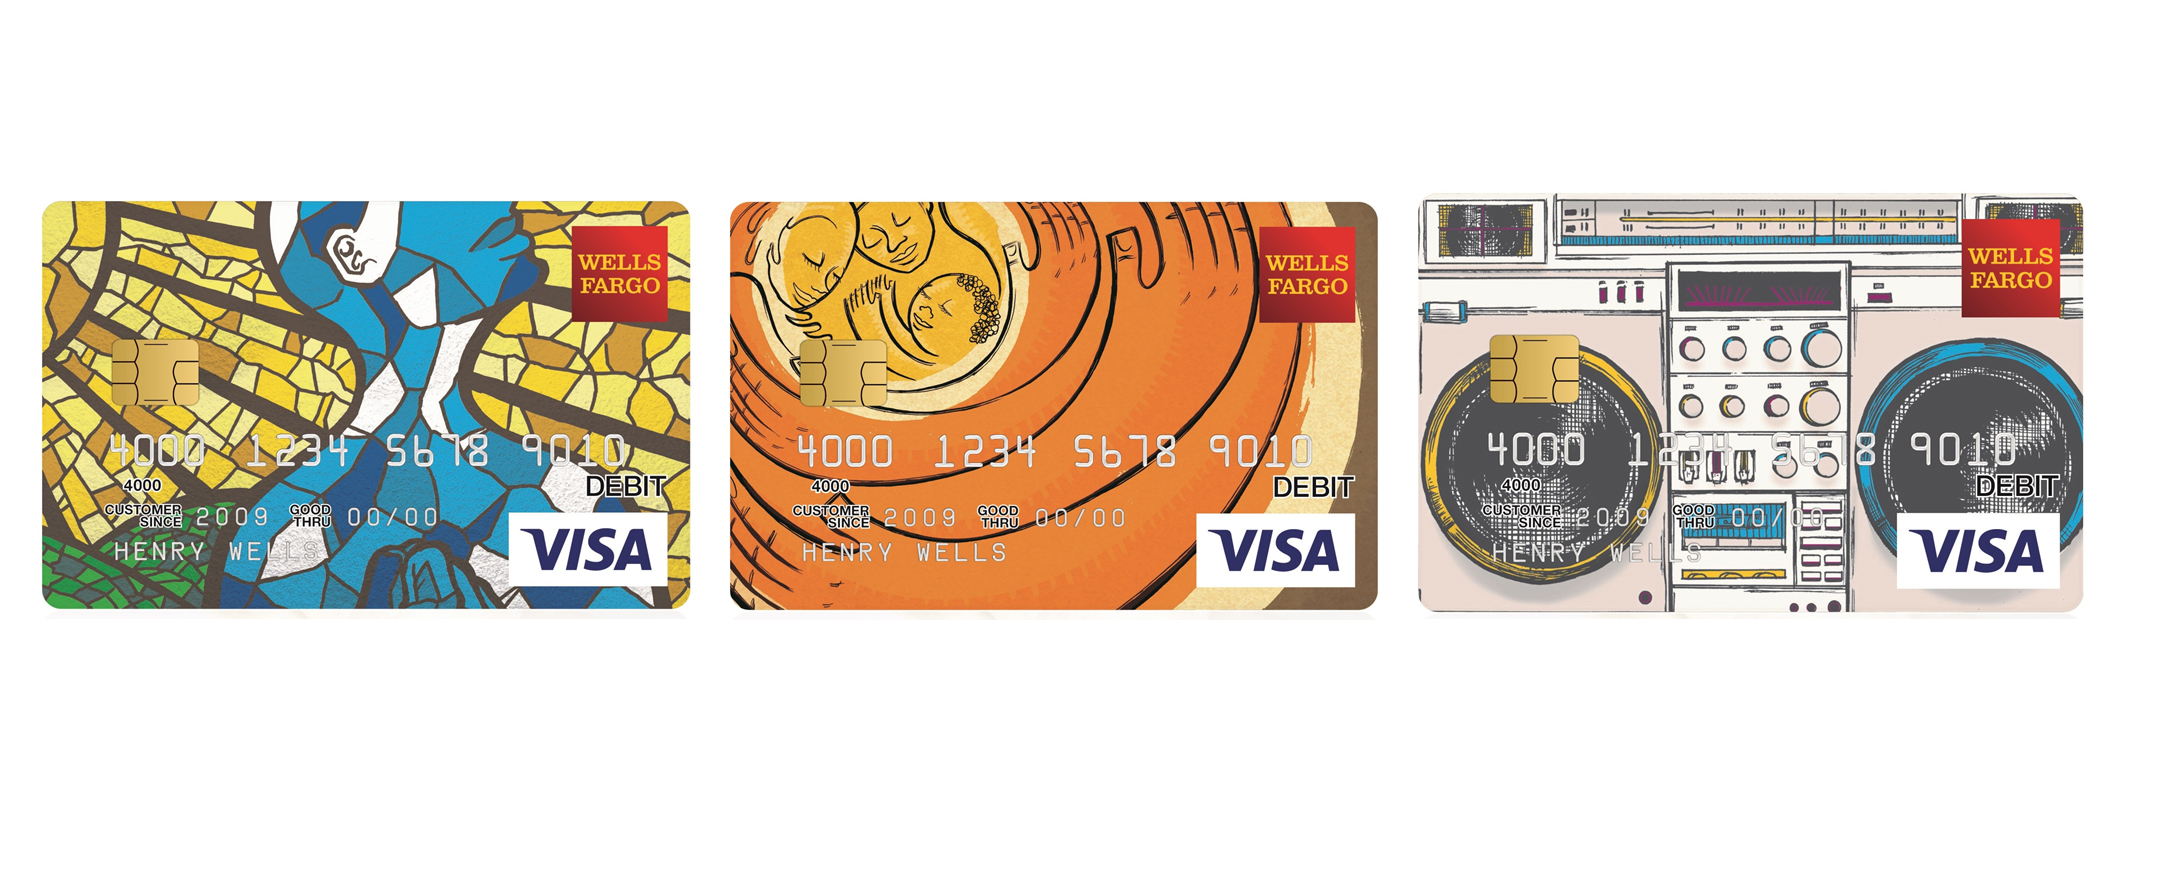 Emejing Wells Fargo Card Design Ideas Gallery - Decorating ...